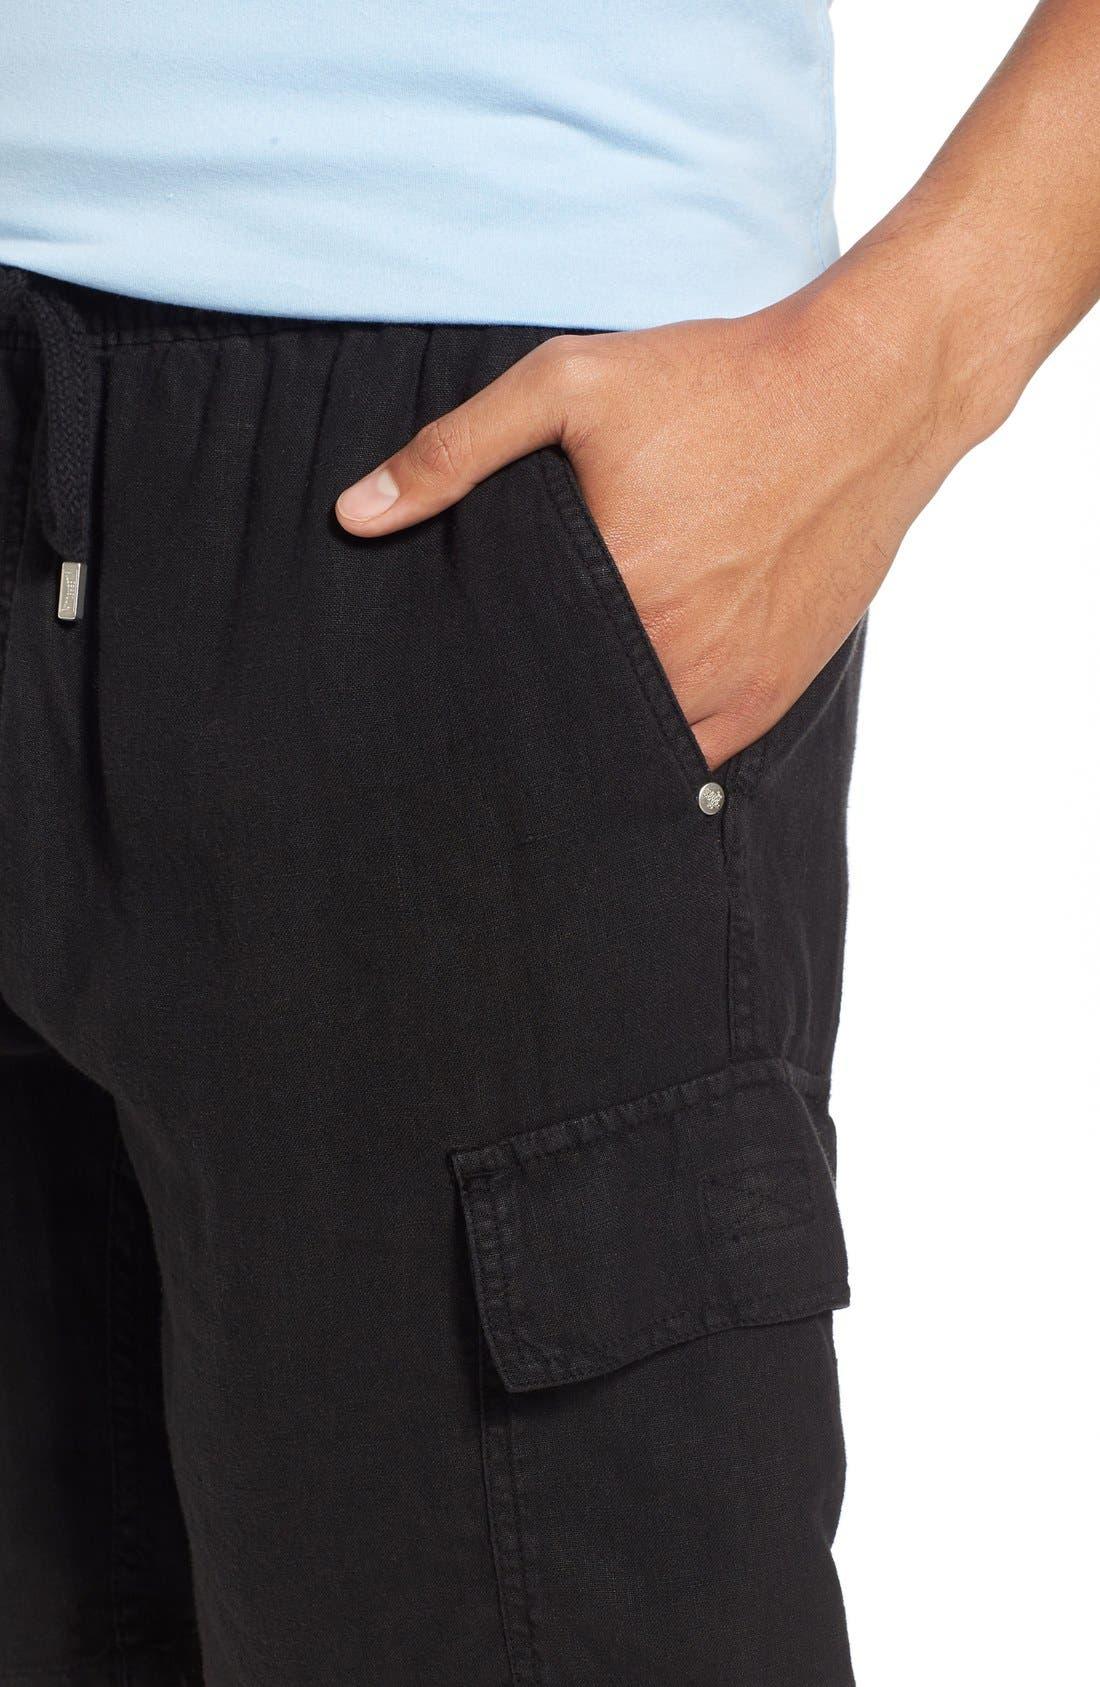 Vilbrequin Linen Cargo Shorts,                             Alternate thumbnail 4, color,                             001